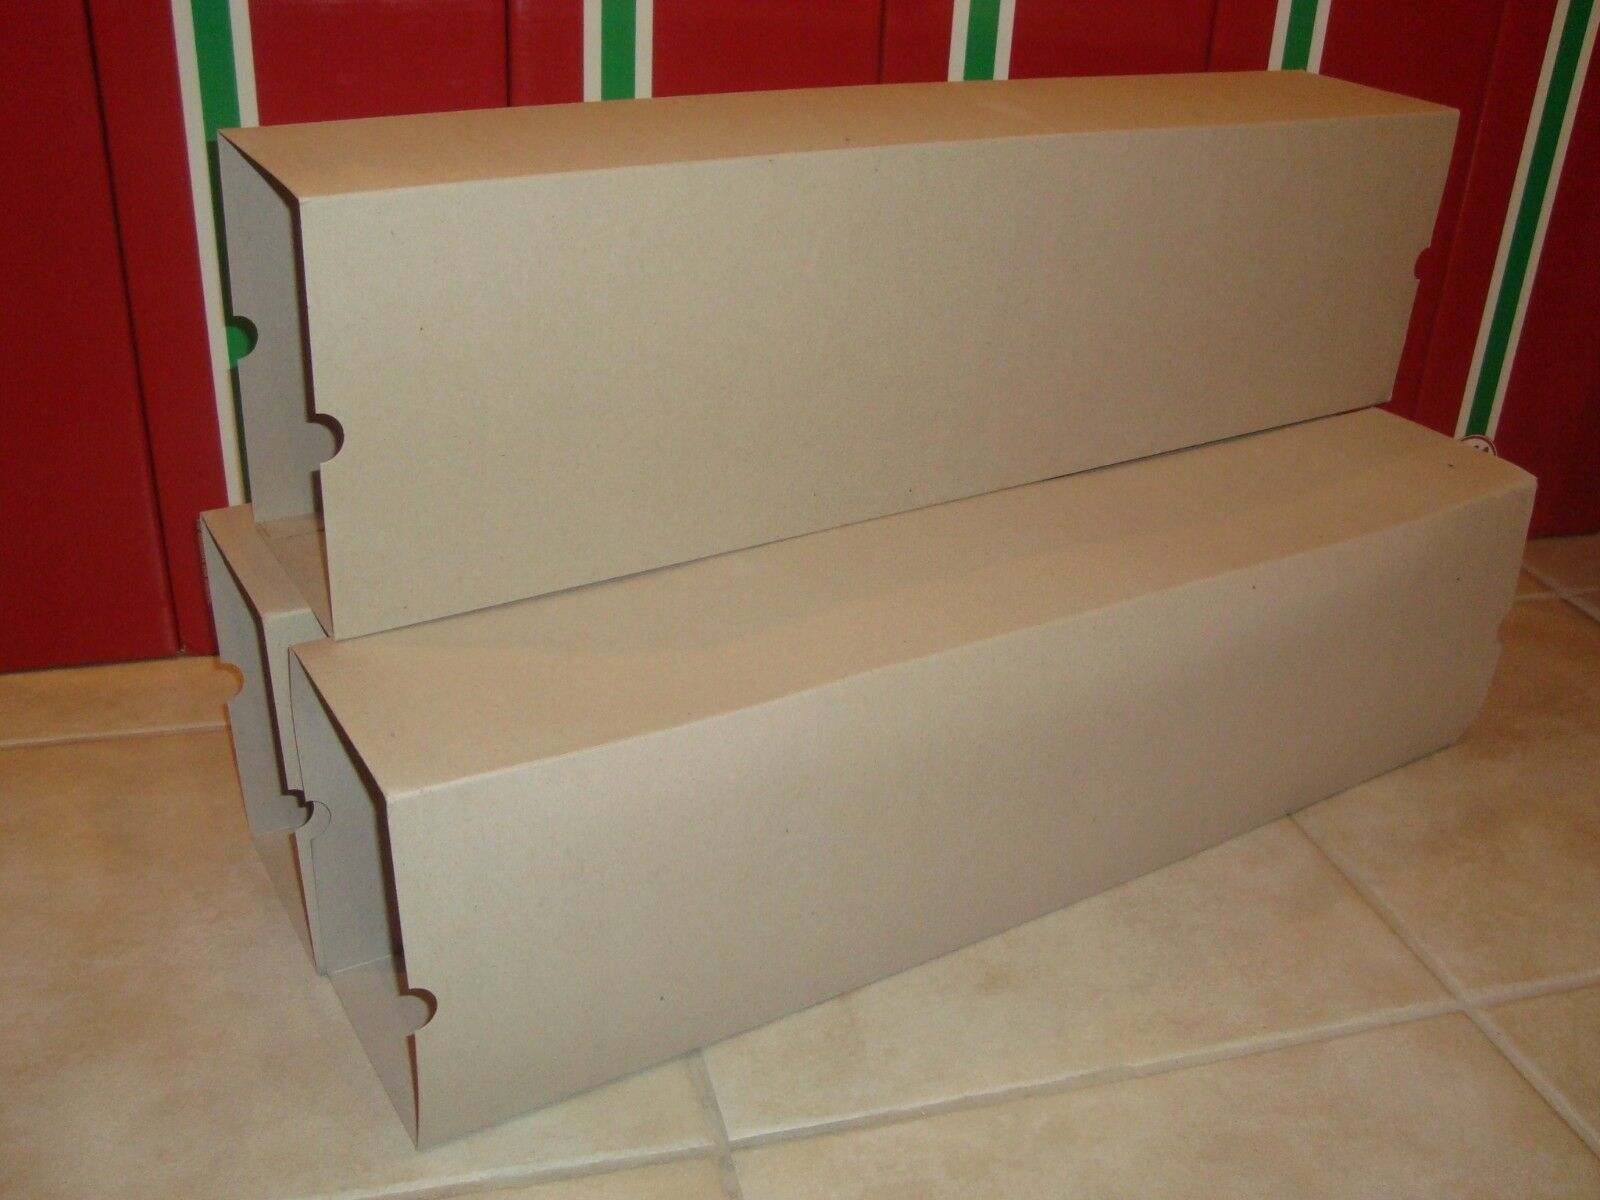 LGB STREAMLINER ORIGINAL ORIGINAL ORIGINAL OUTER CARDBOARD SLEEVES WINDOW BOX PredECTORS 3 PIECES  ae81de